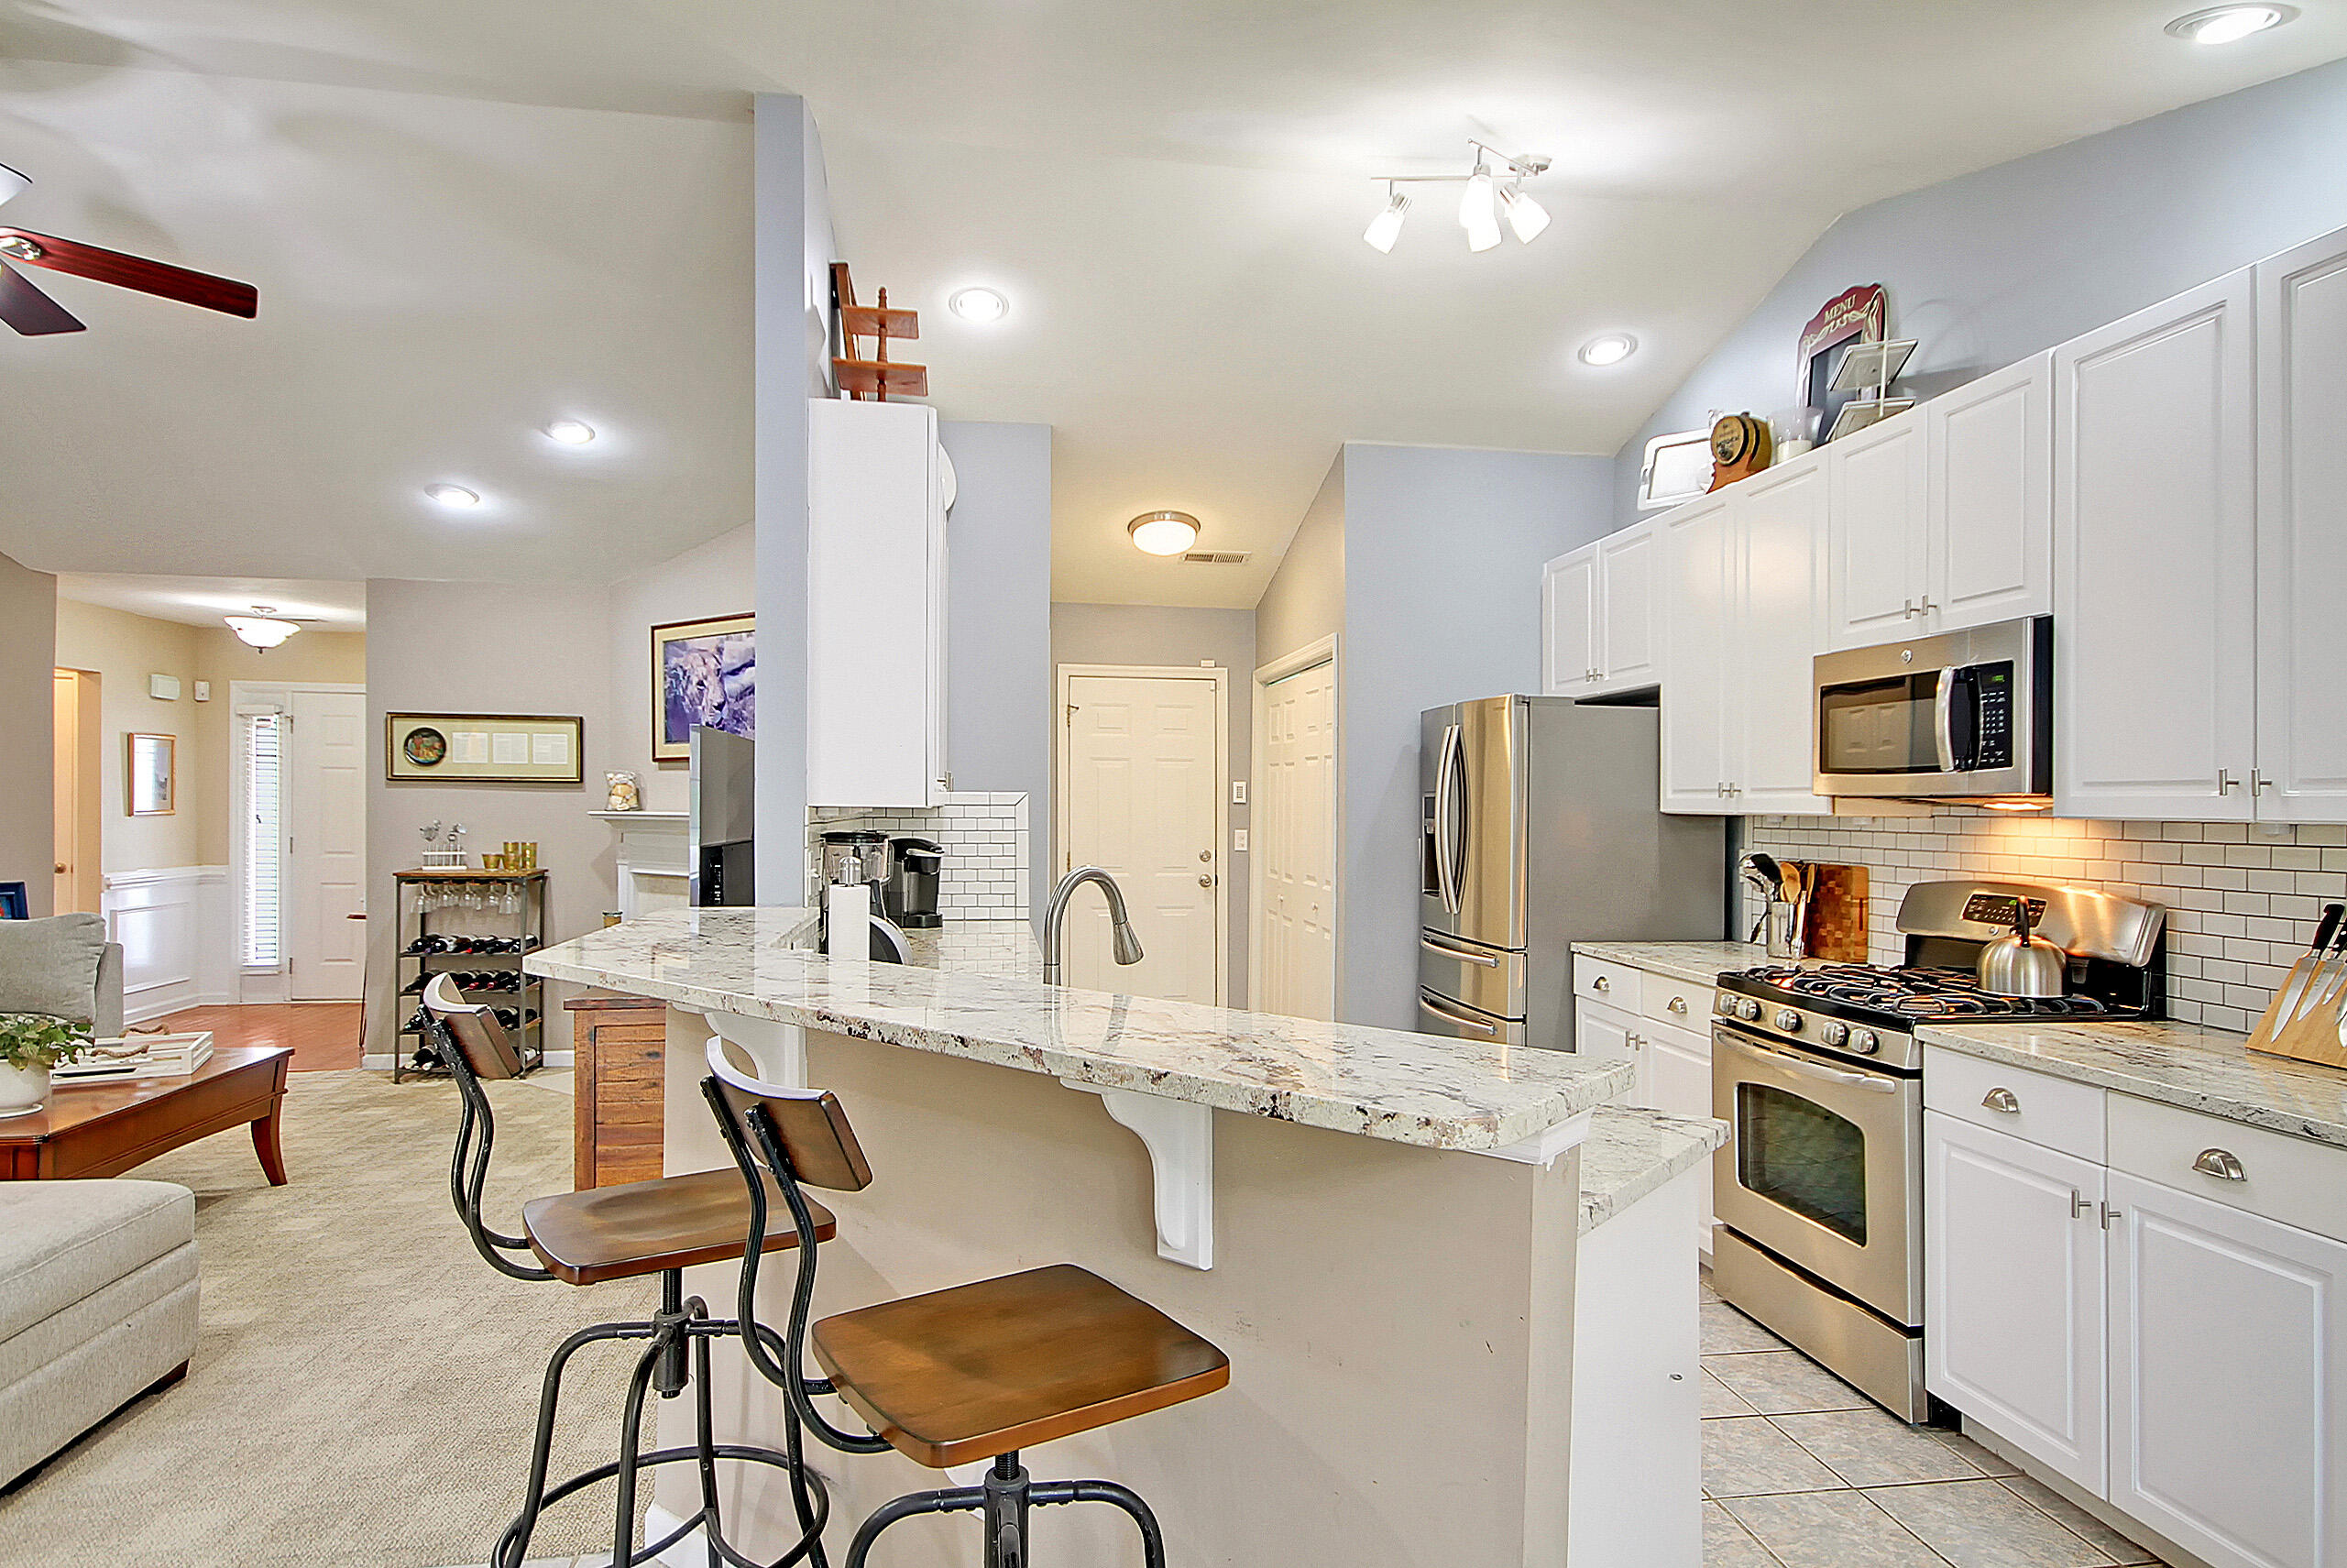 Park West Homes For Sale - 1460 Wellesley, Mount Pleasant, SC - 33